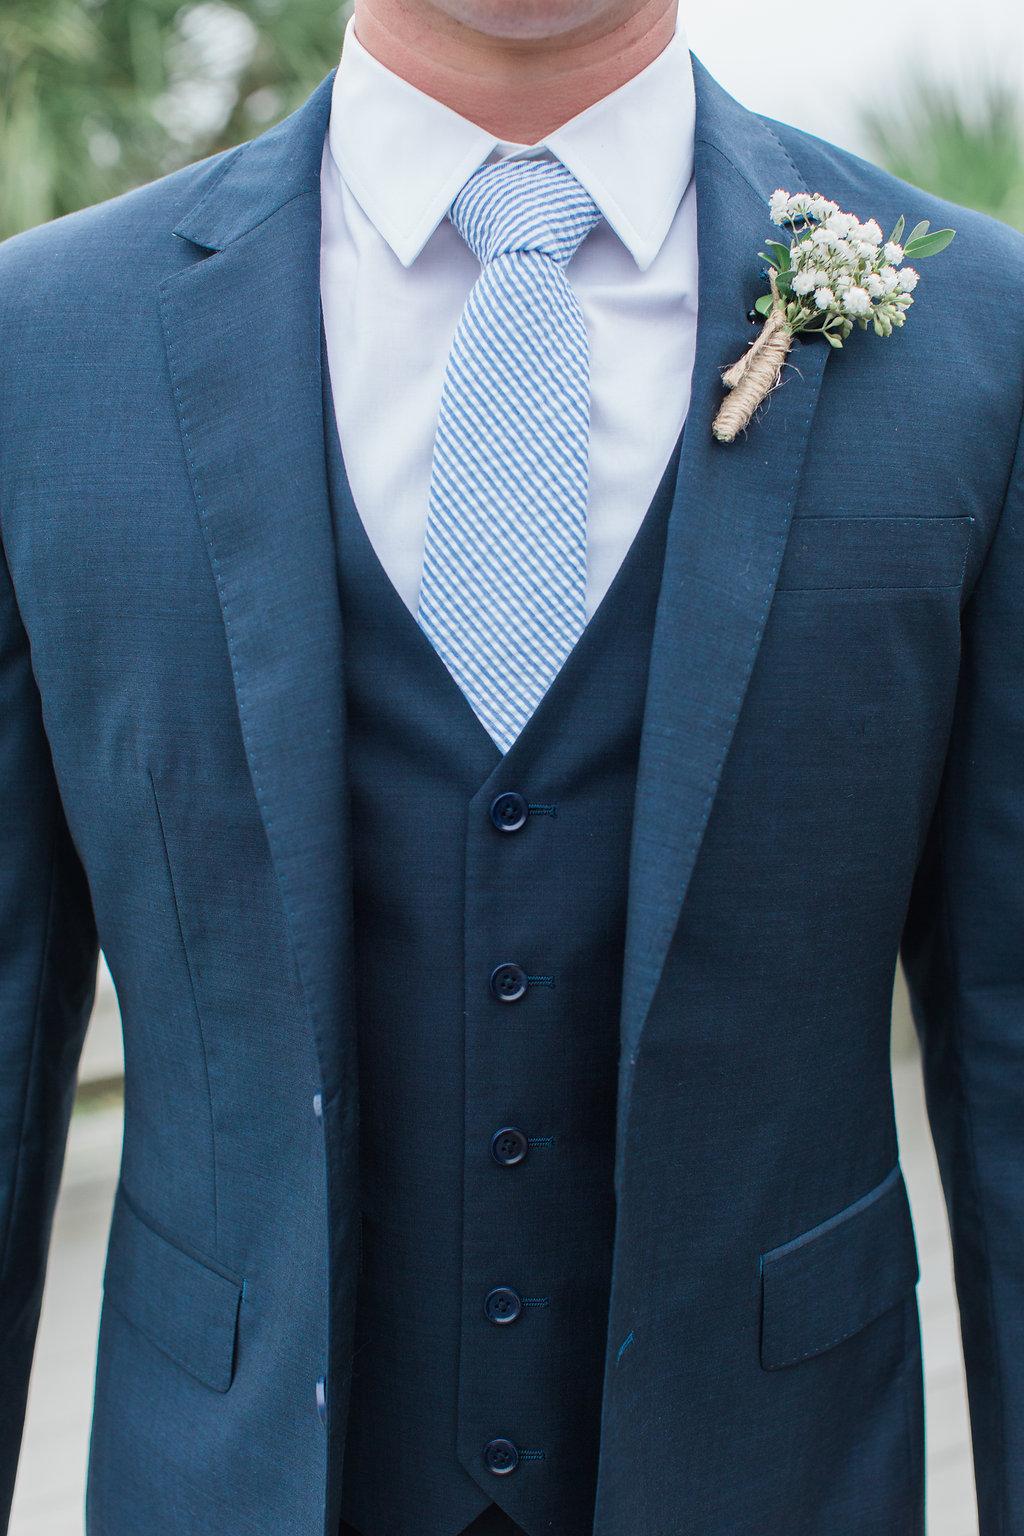 stacey-and-tj-wedding-apartment-b-photography-ivory-and-beau-bridal-boutique-savannah-wedding-dresses-daughters-of-simone-lu-boho-bride-boho-wedding-savannah-boho-wedding-savannah-weddings-savannah-bridal-gowns-savannah-wedding-26.jpg